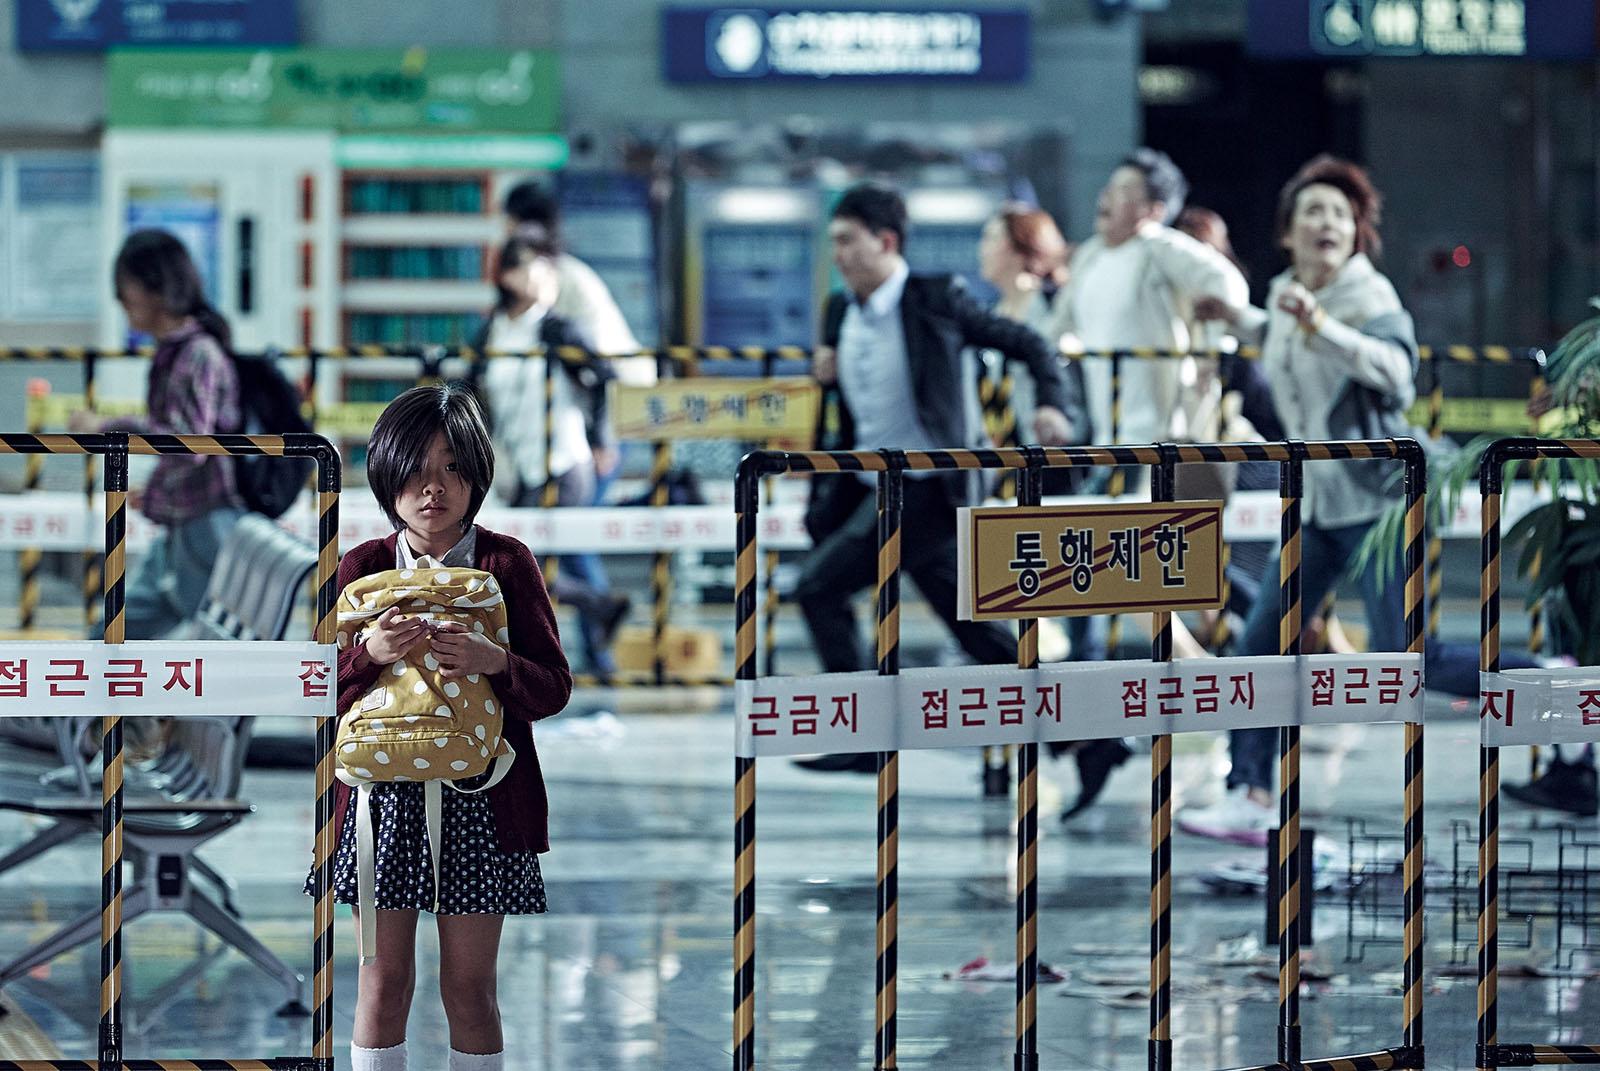 dernier-train-pour-busan-photo-962440.jpg